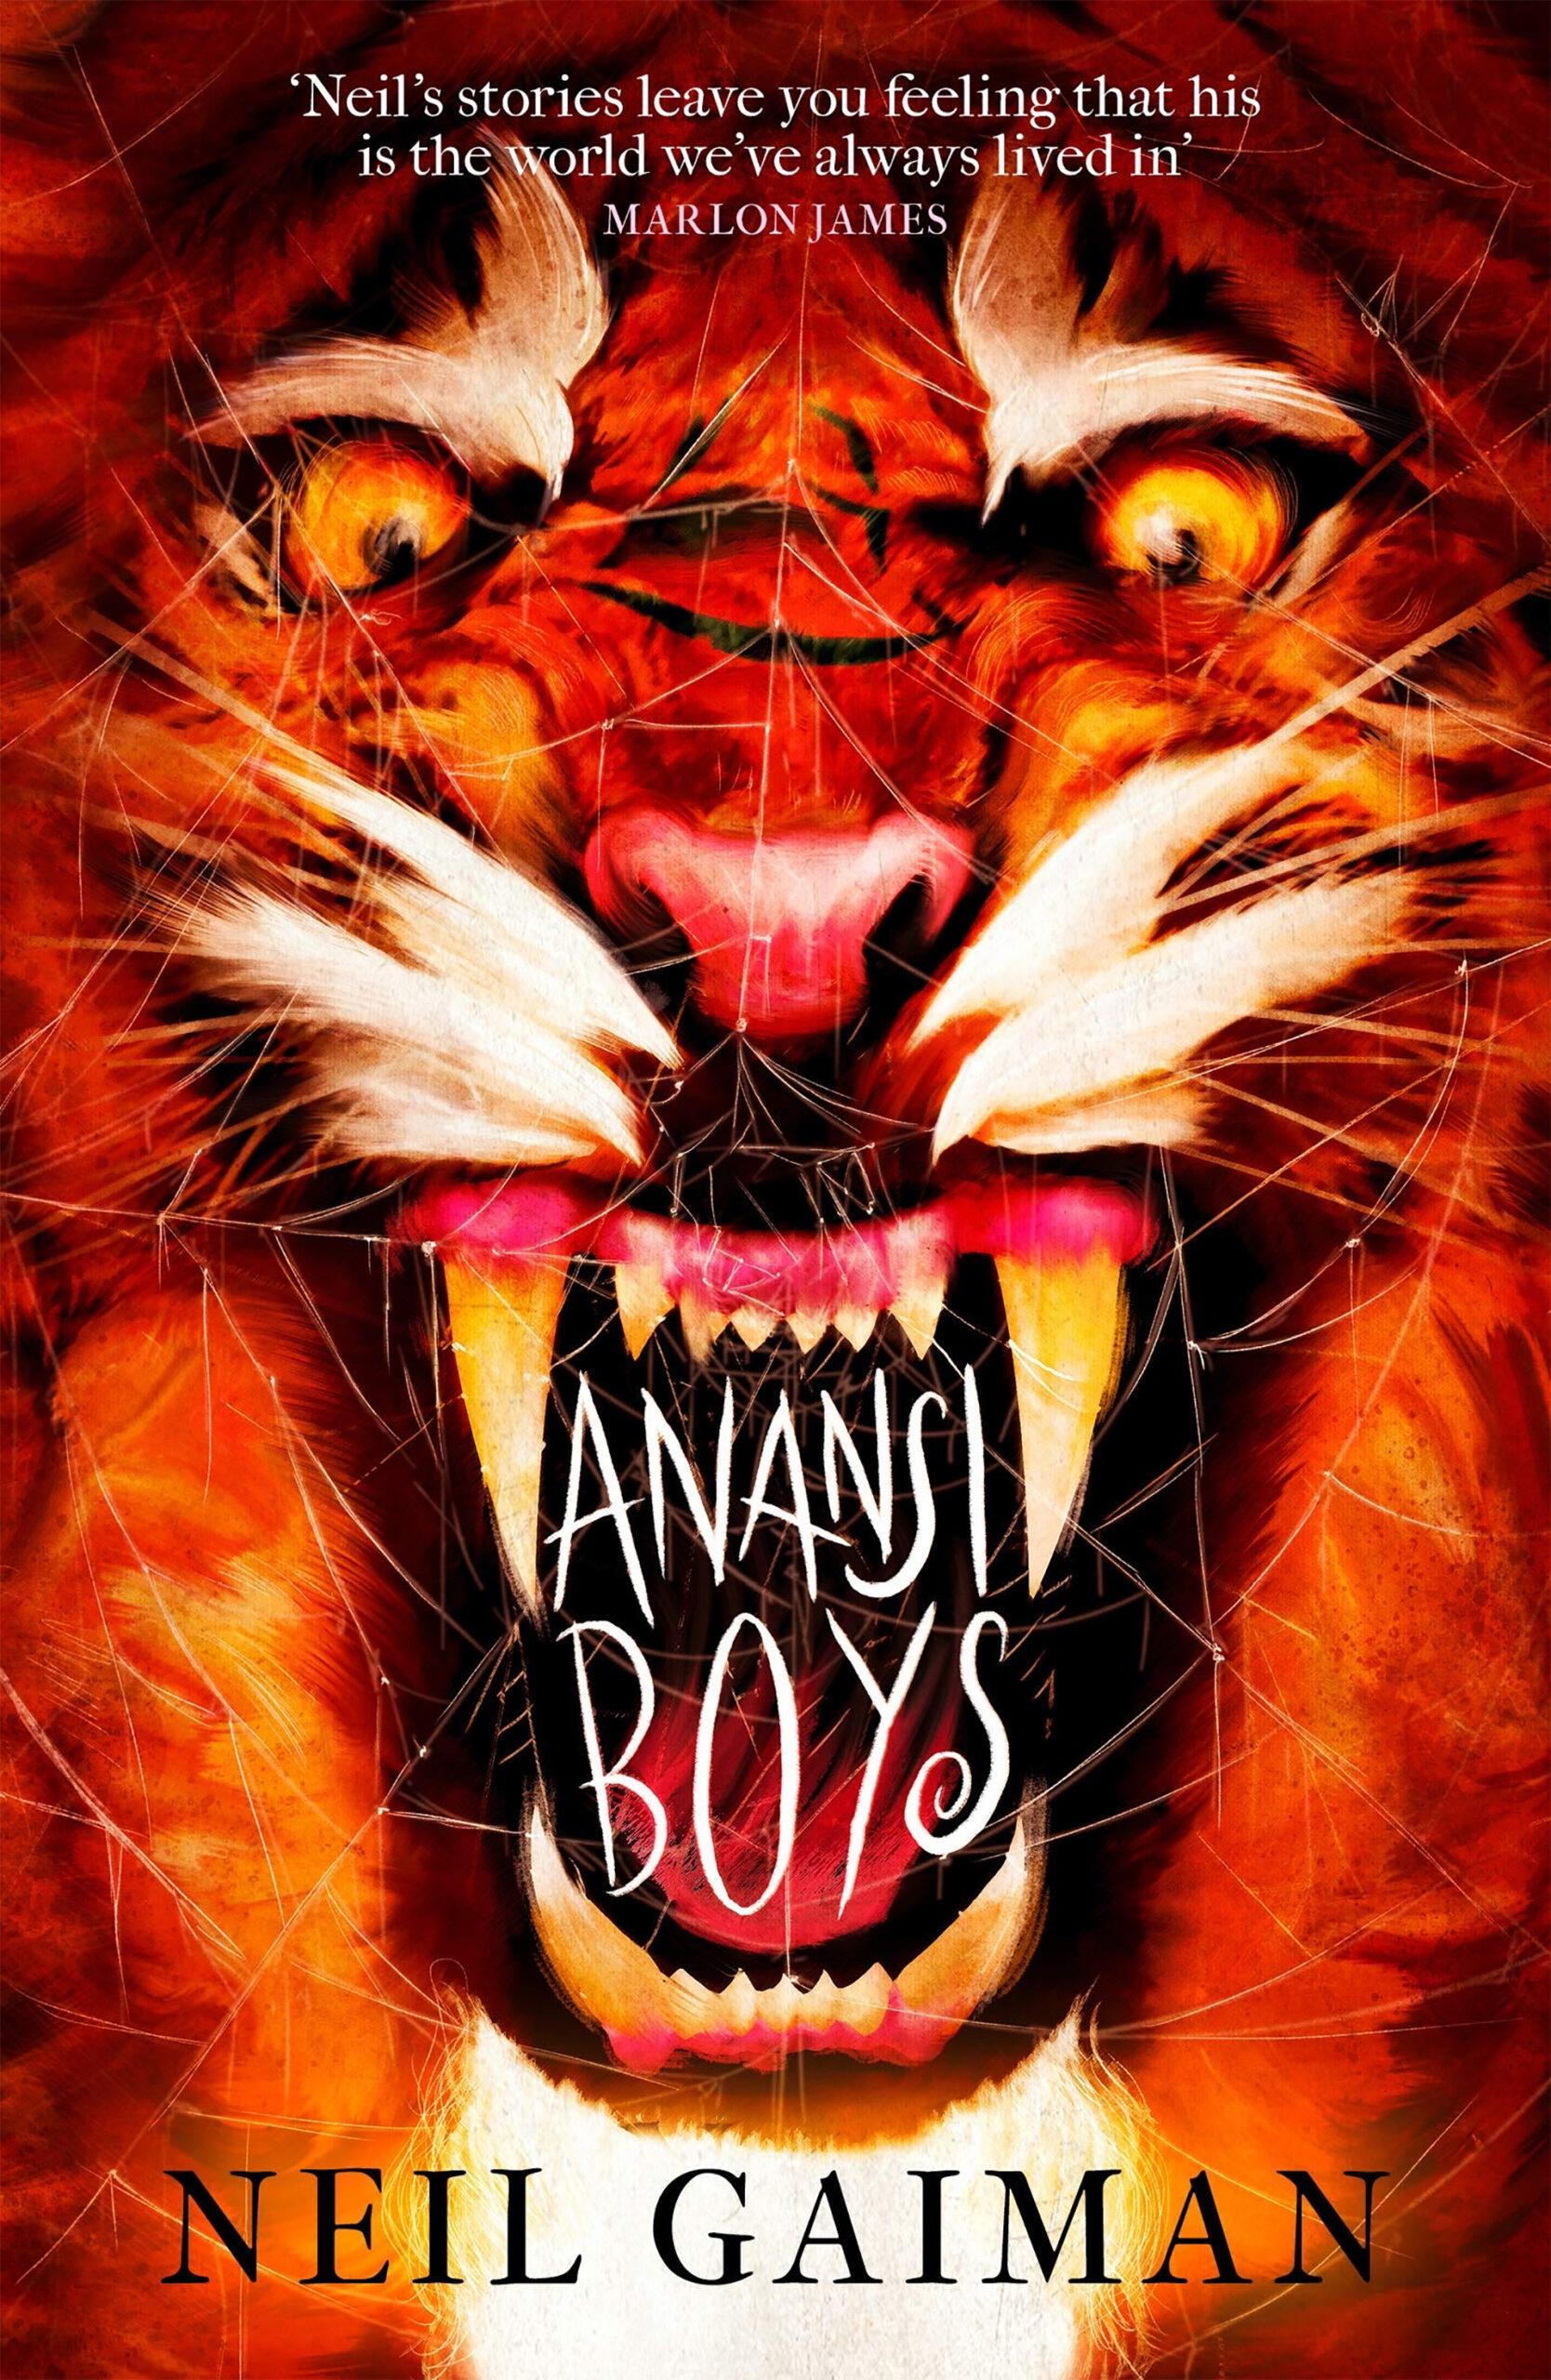 anansi boys malachi kirby cast (2)